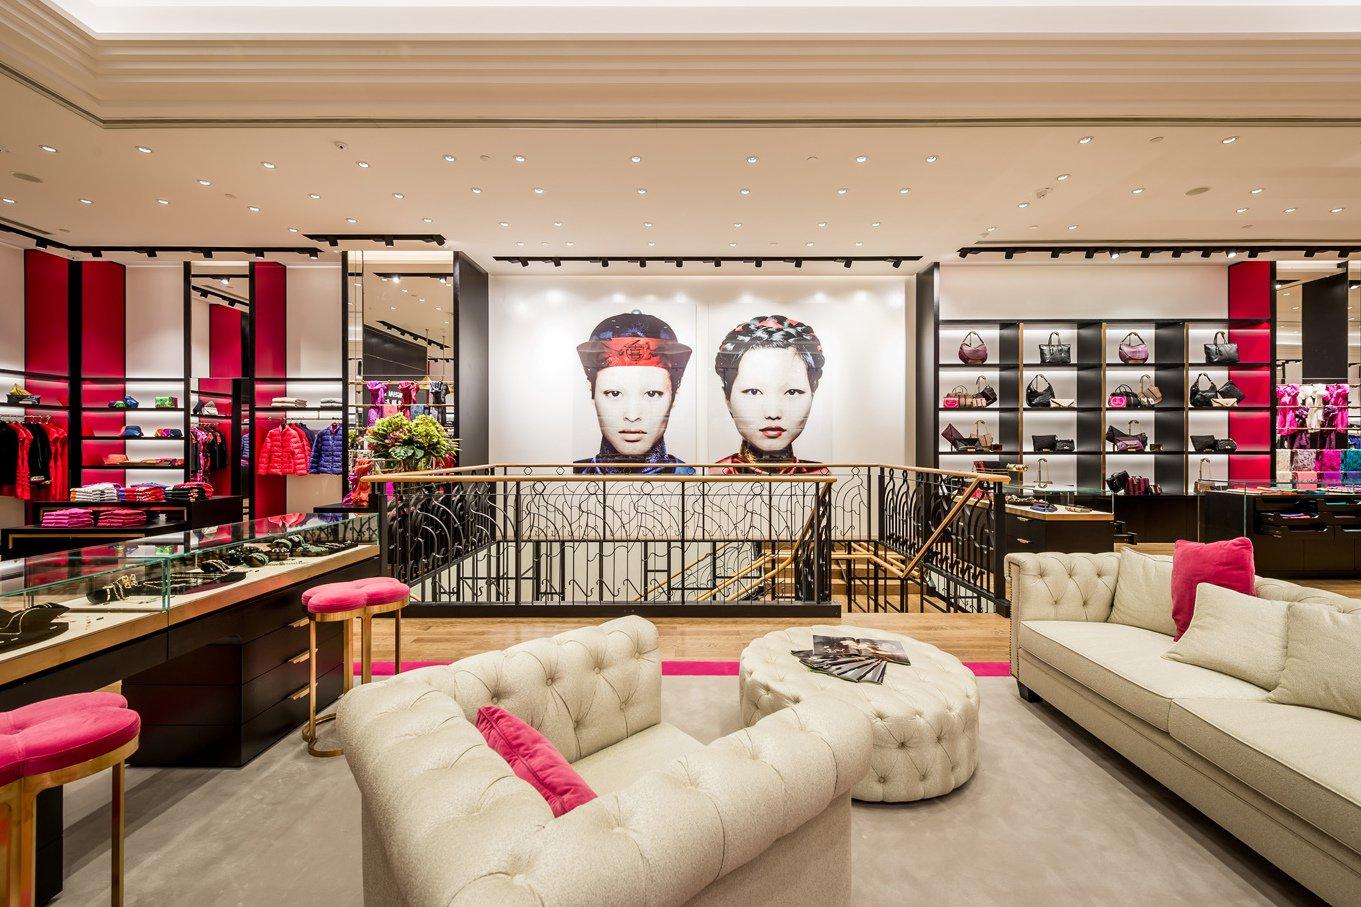 Macau store image